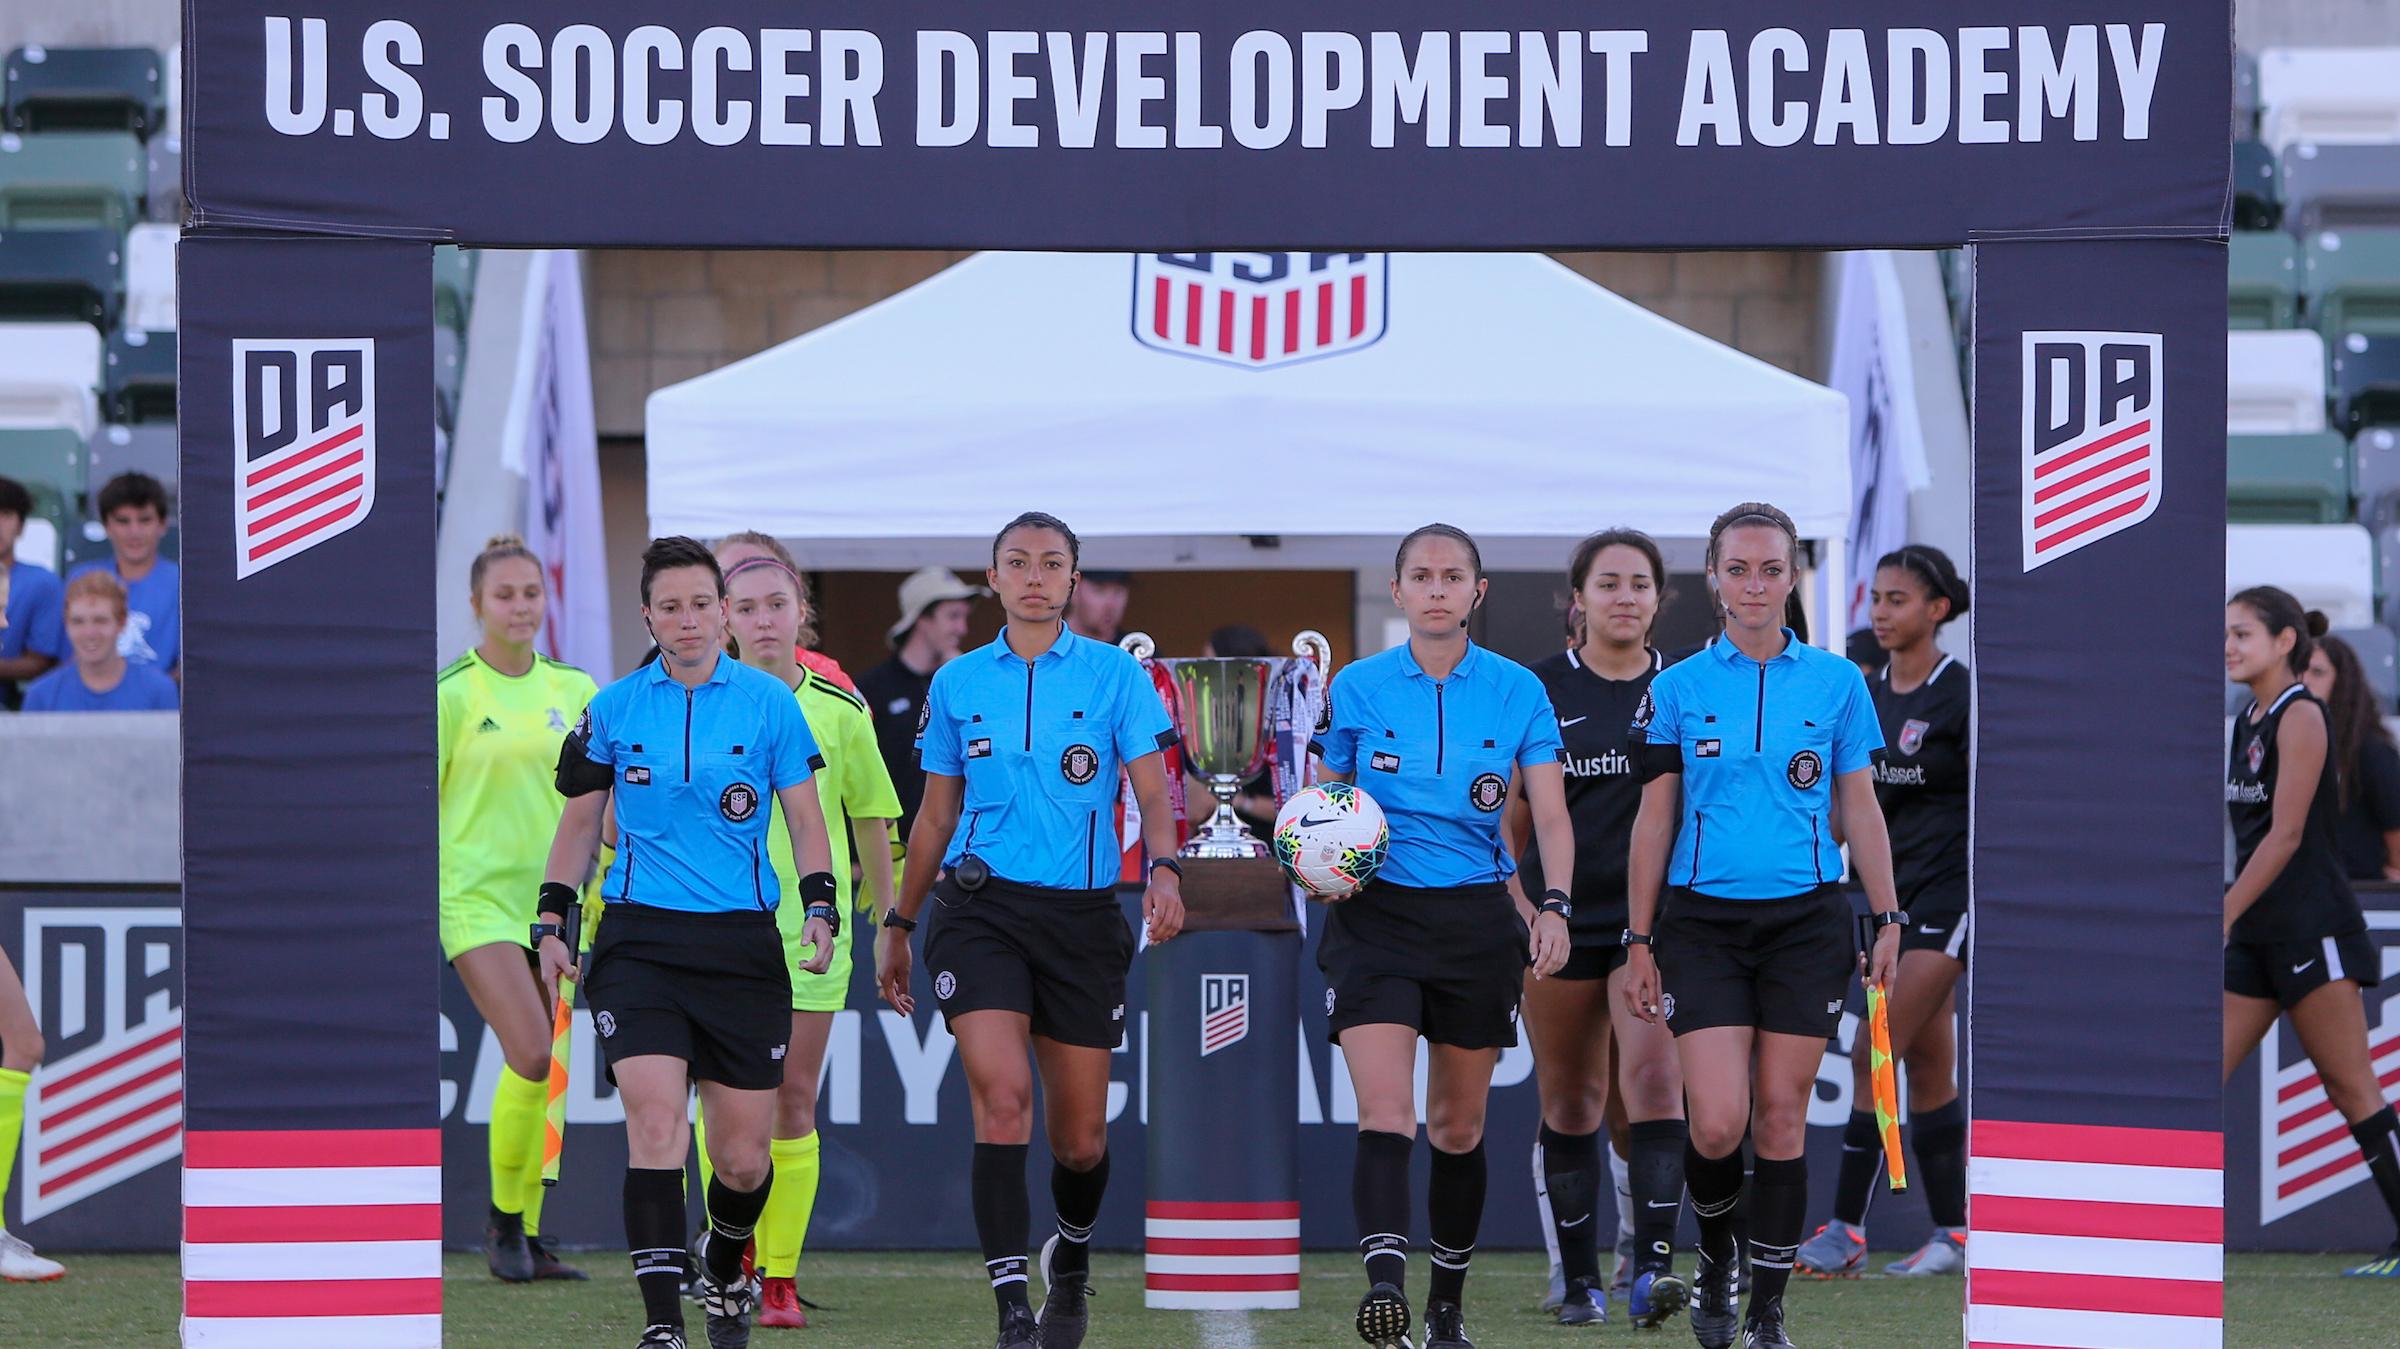 U.S. Soccer announces end of Development Academy operations